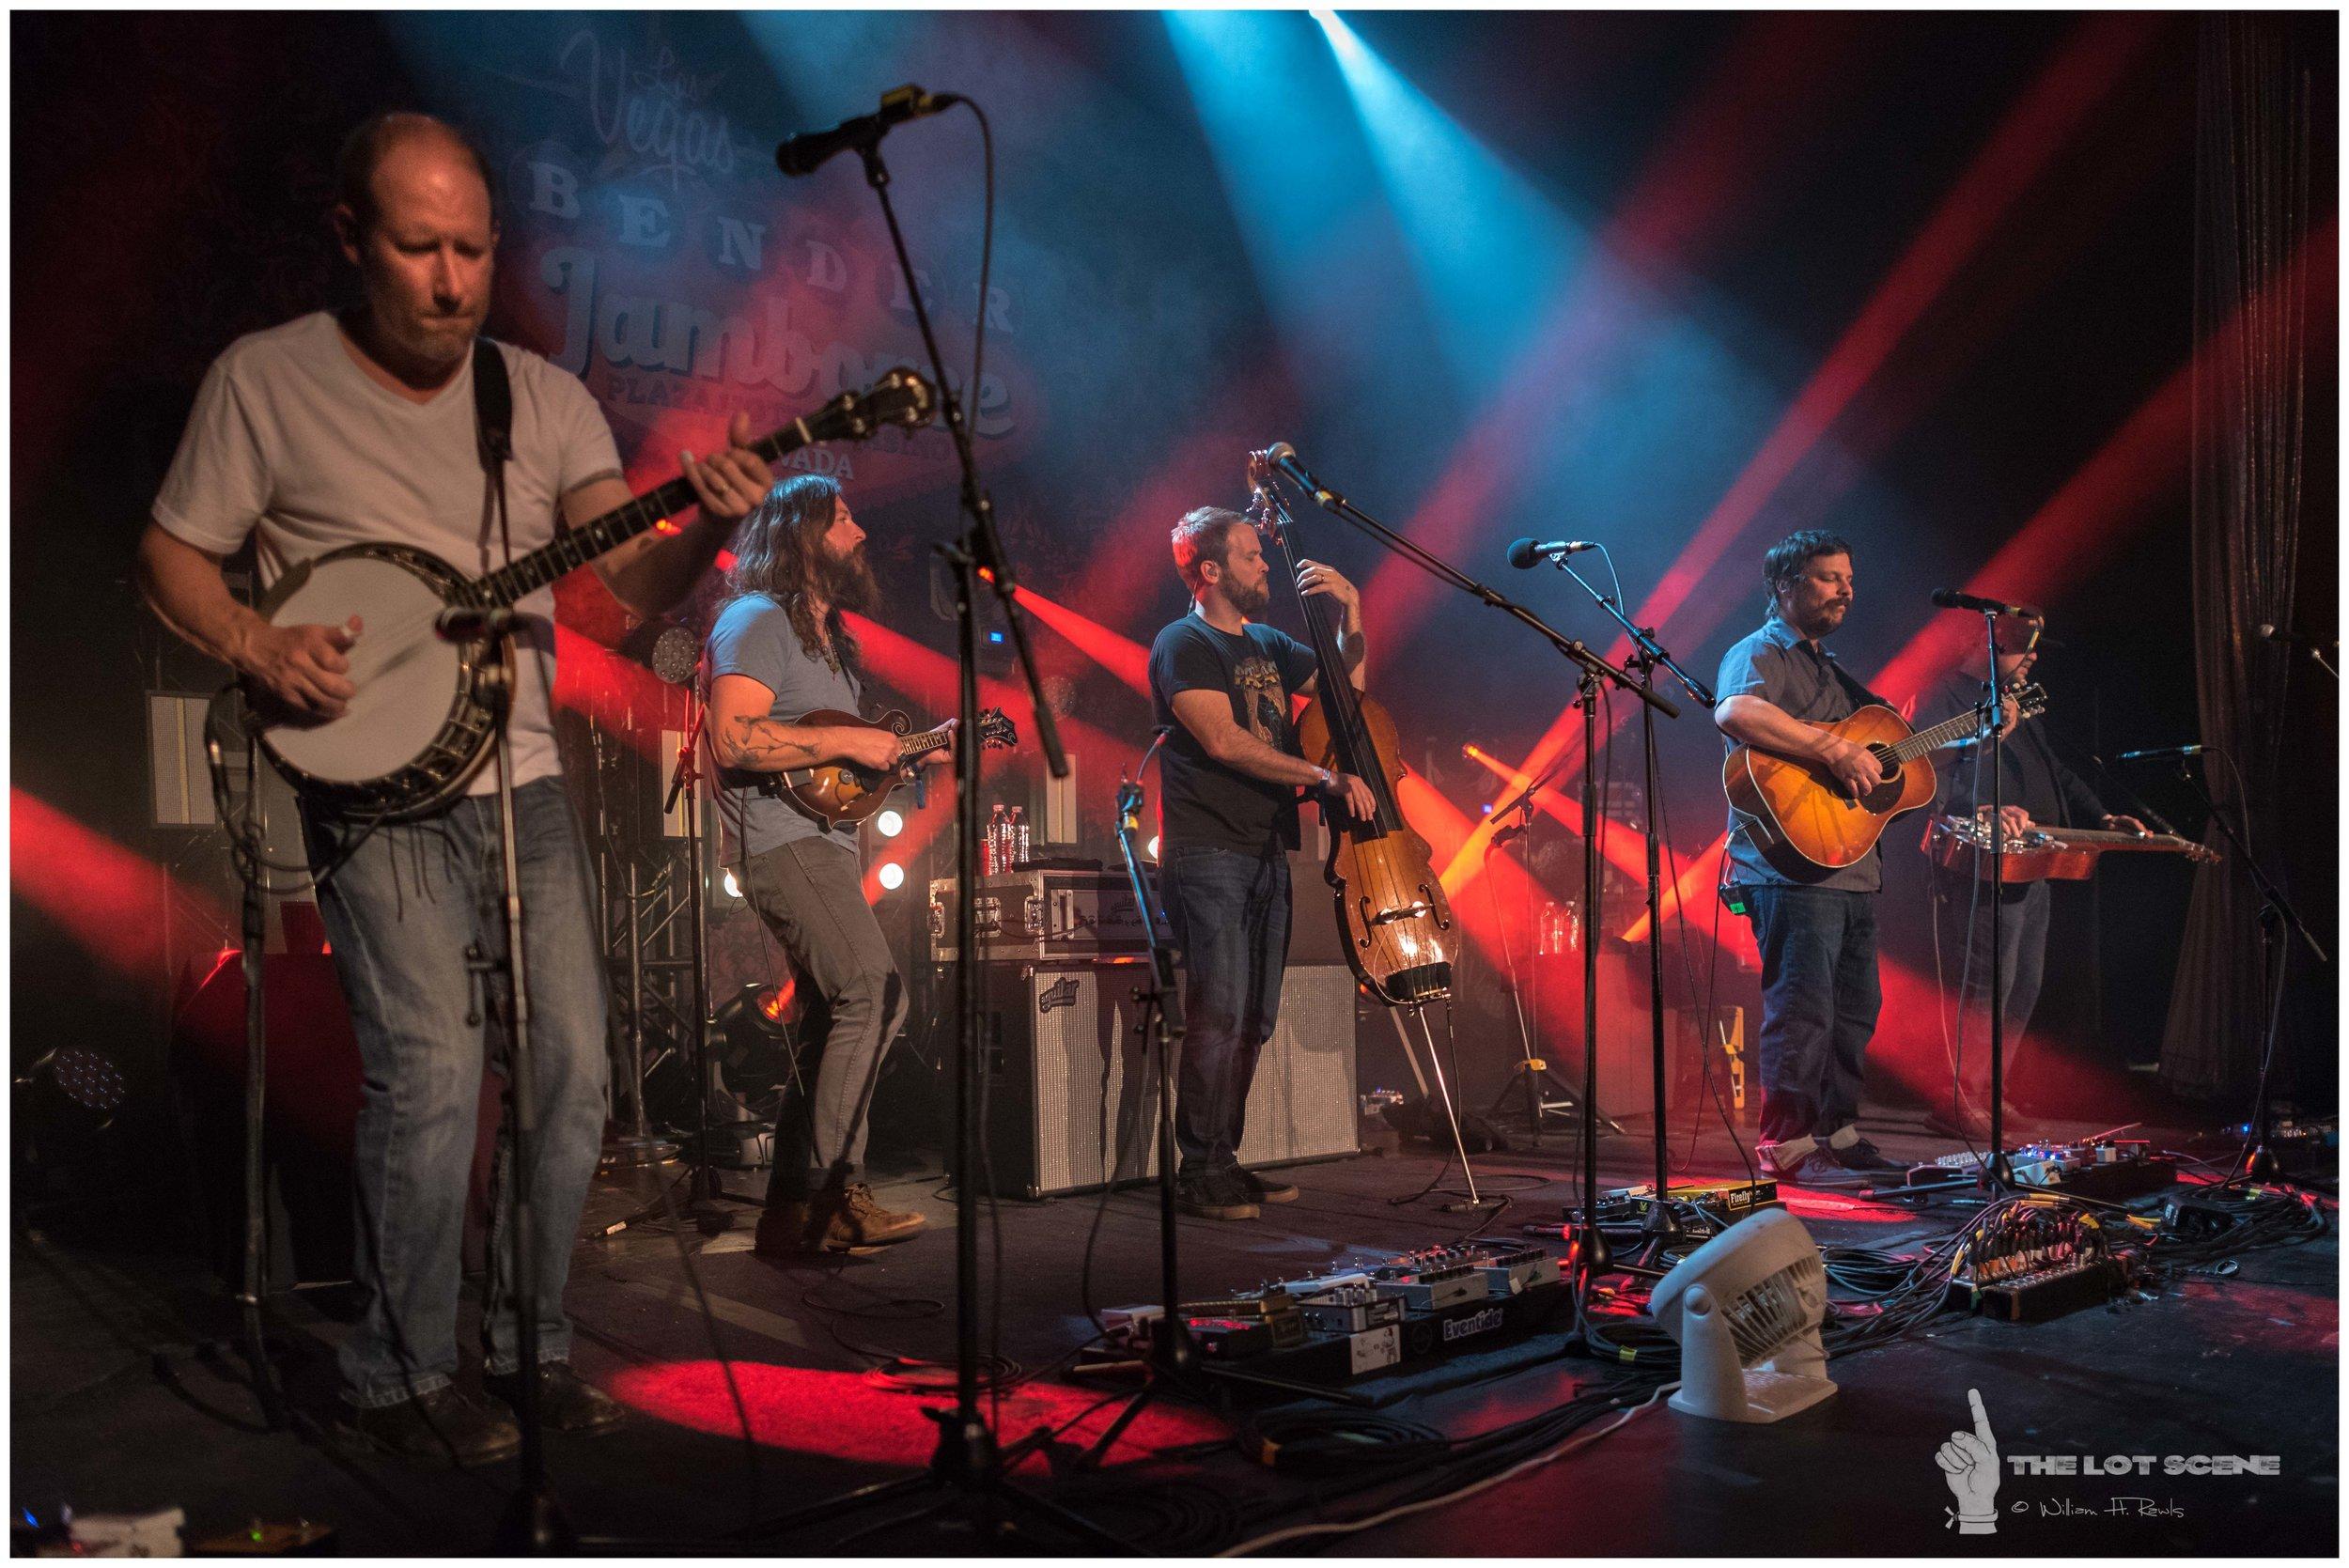 Bender Jamboree 2018 - Greensky Bluegrass - 2.jpg